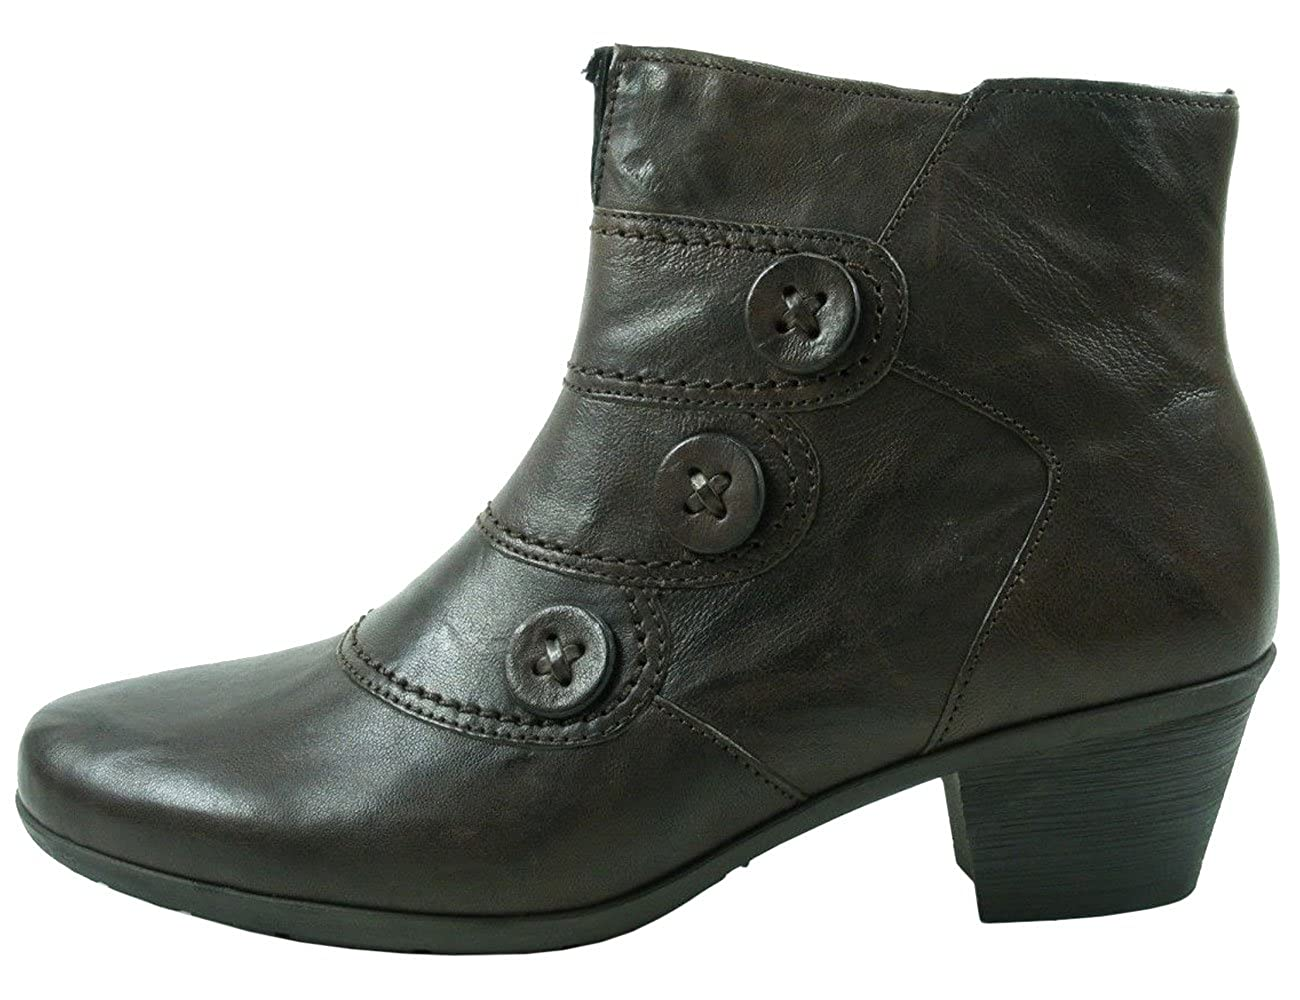 Gabor 74-695 Ankle Schuhe Damen Stiefeletten Ankle 74-695 Stiefel Best Fitting d2e55e